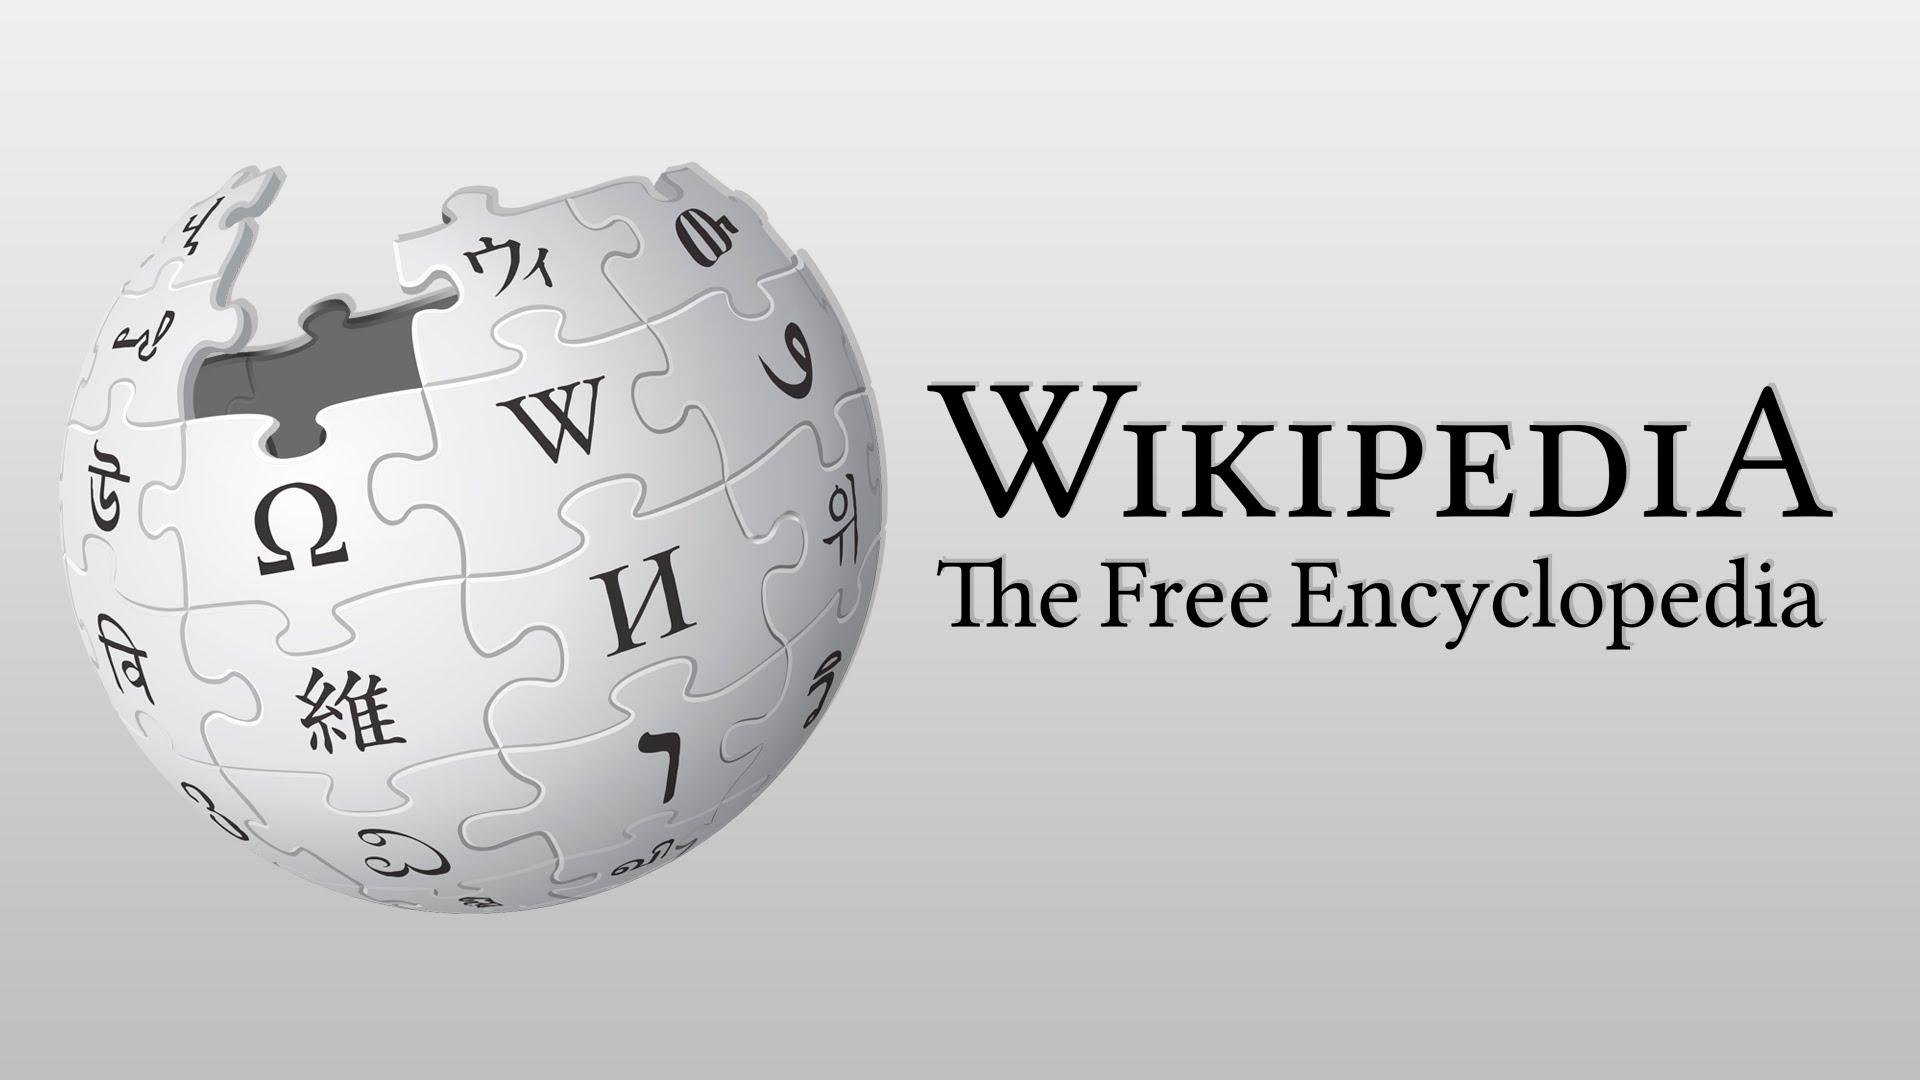 Should We Trust Wikipedia?